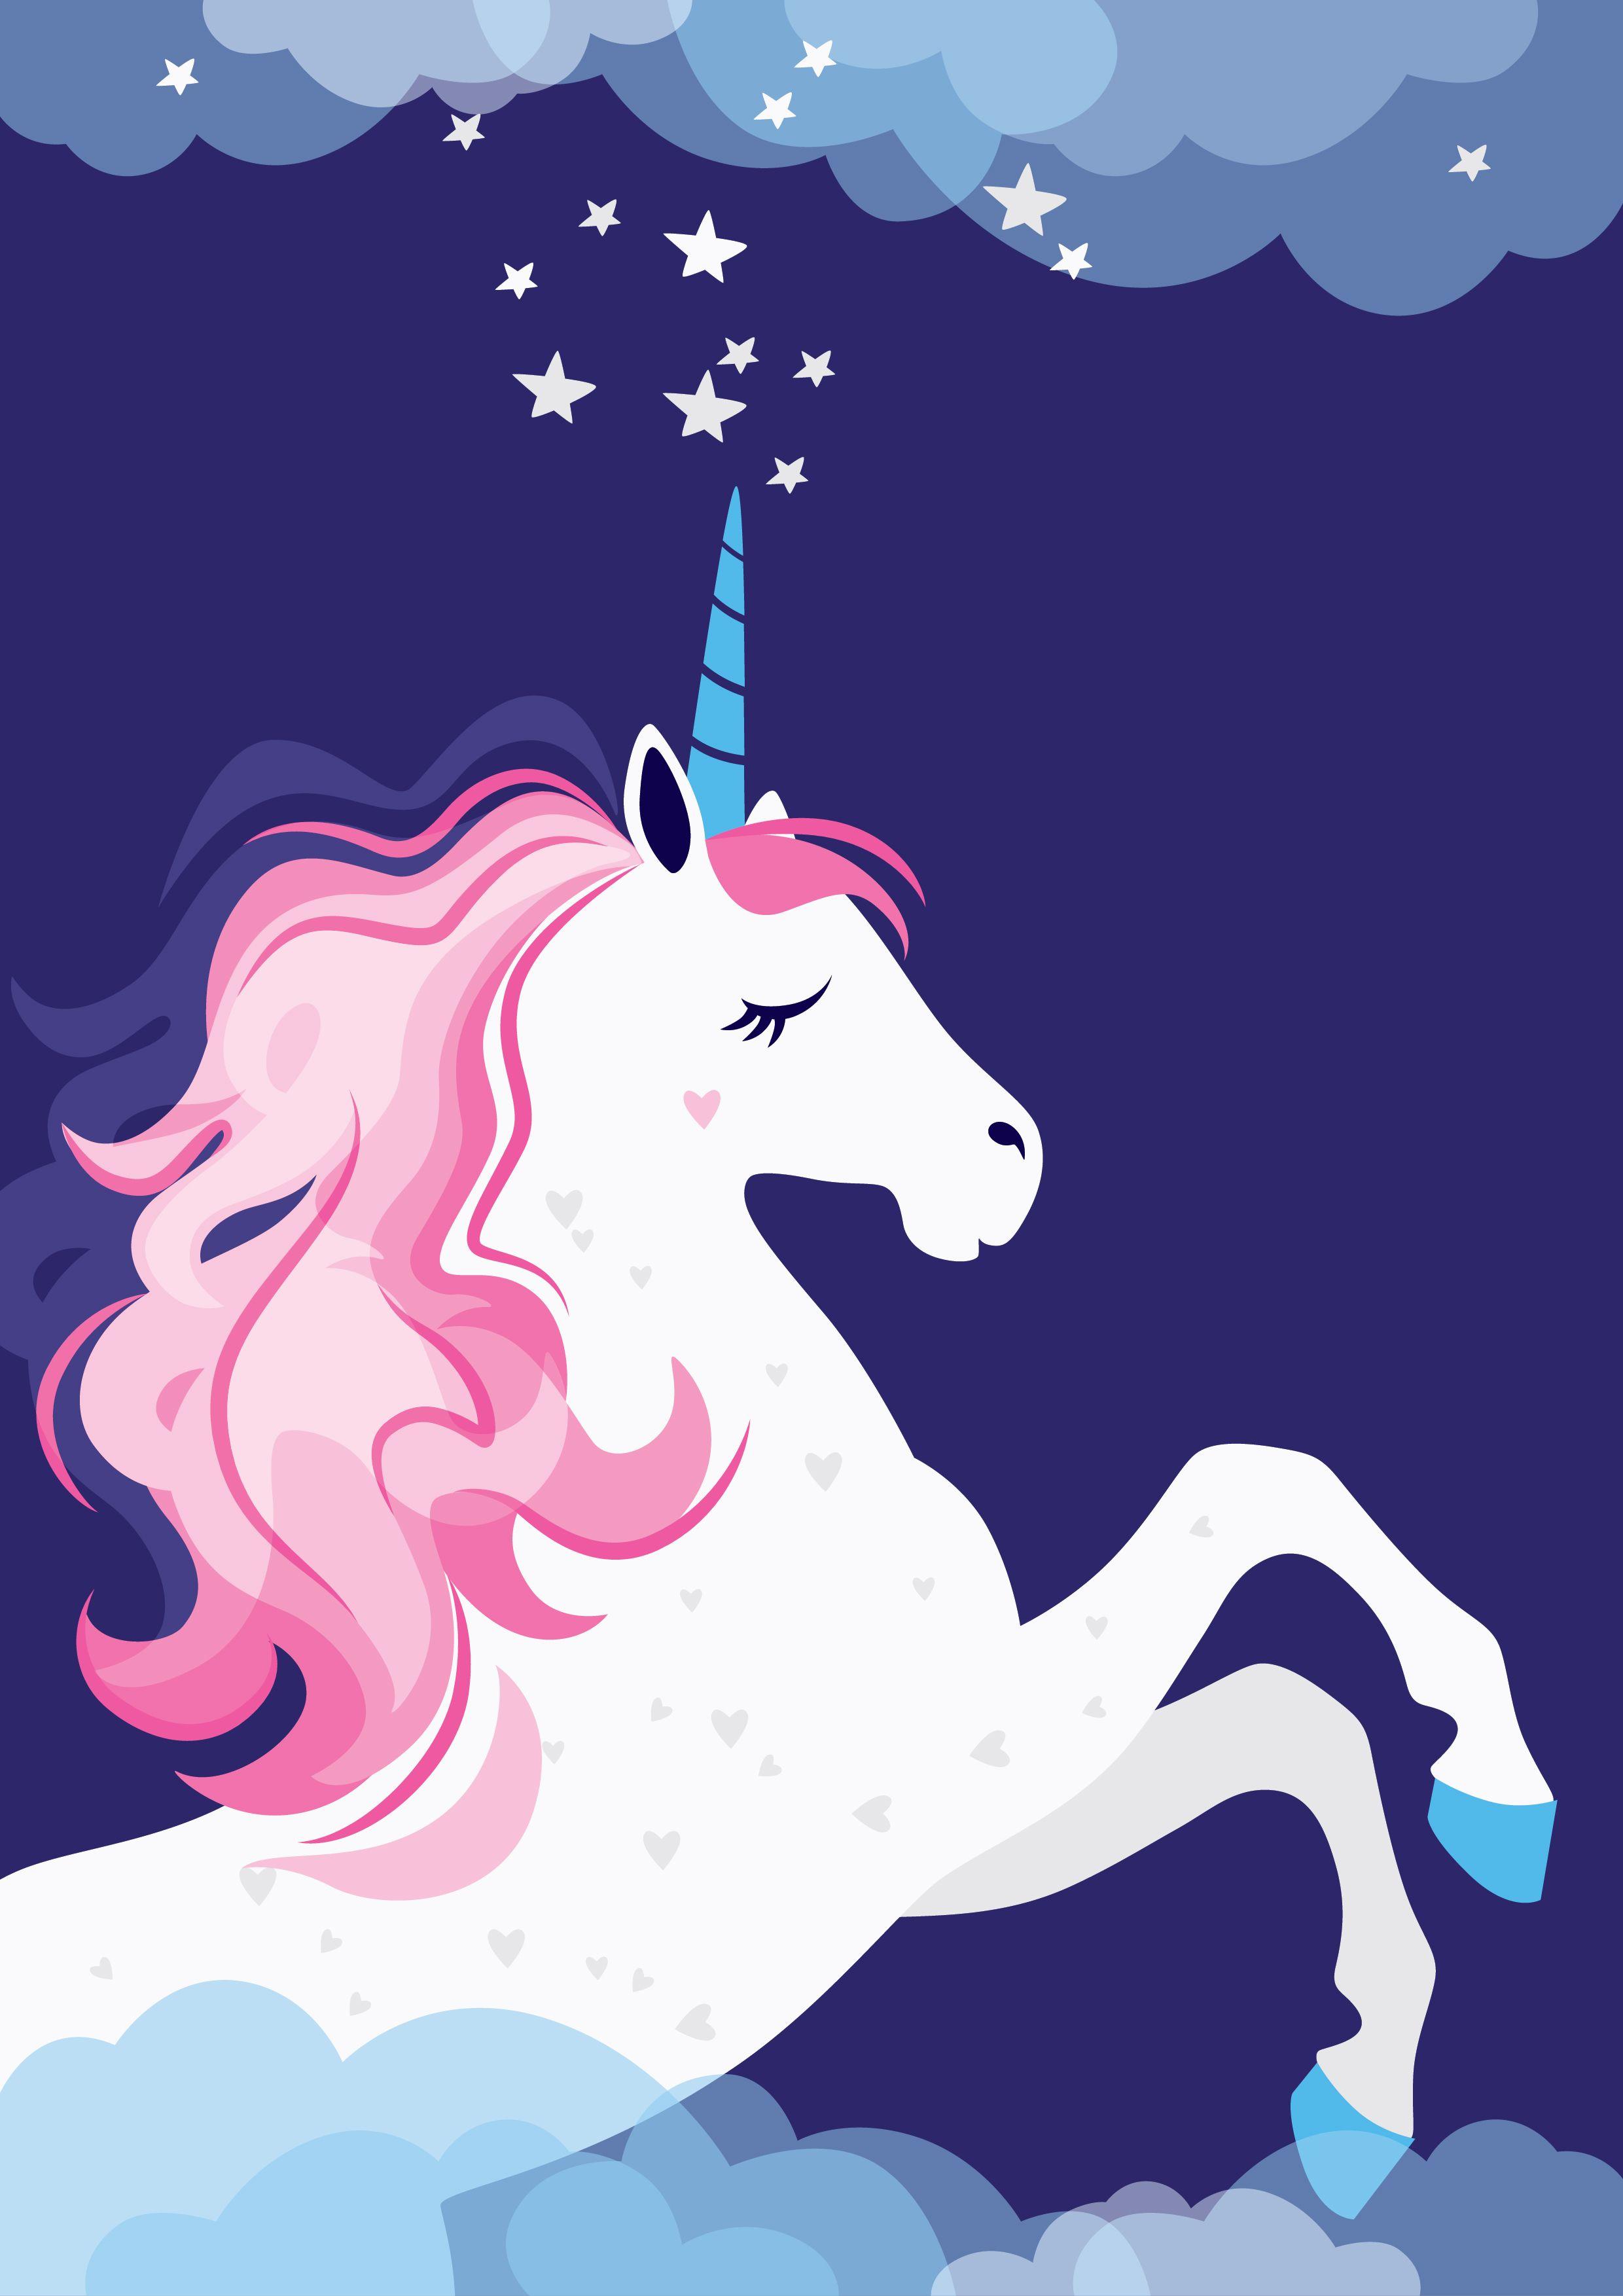 Unicorn Festivalposter Poster Design Pink Kids Girl Momblog Love Fairytail Stars Horse Unicorn Wallpaper Cute Unicorn Art Unicorn Illustration